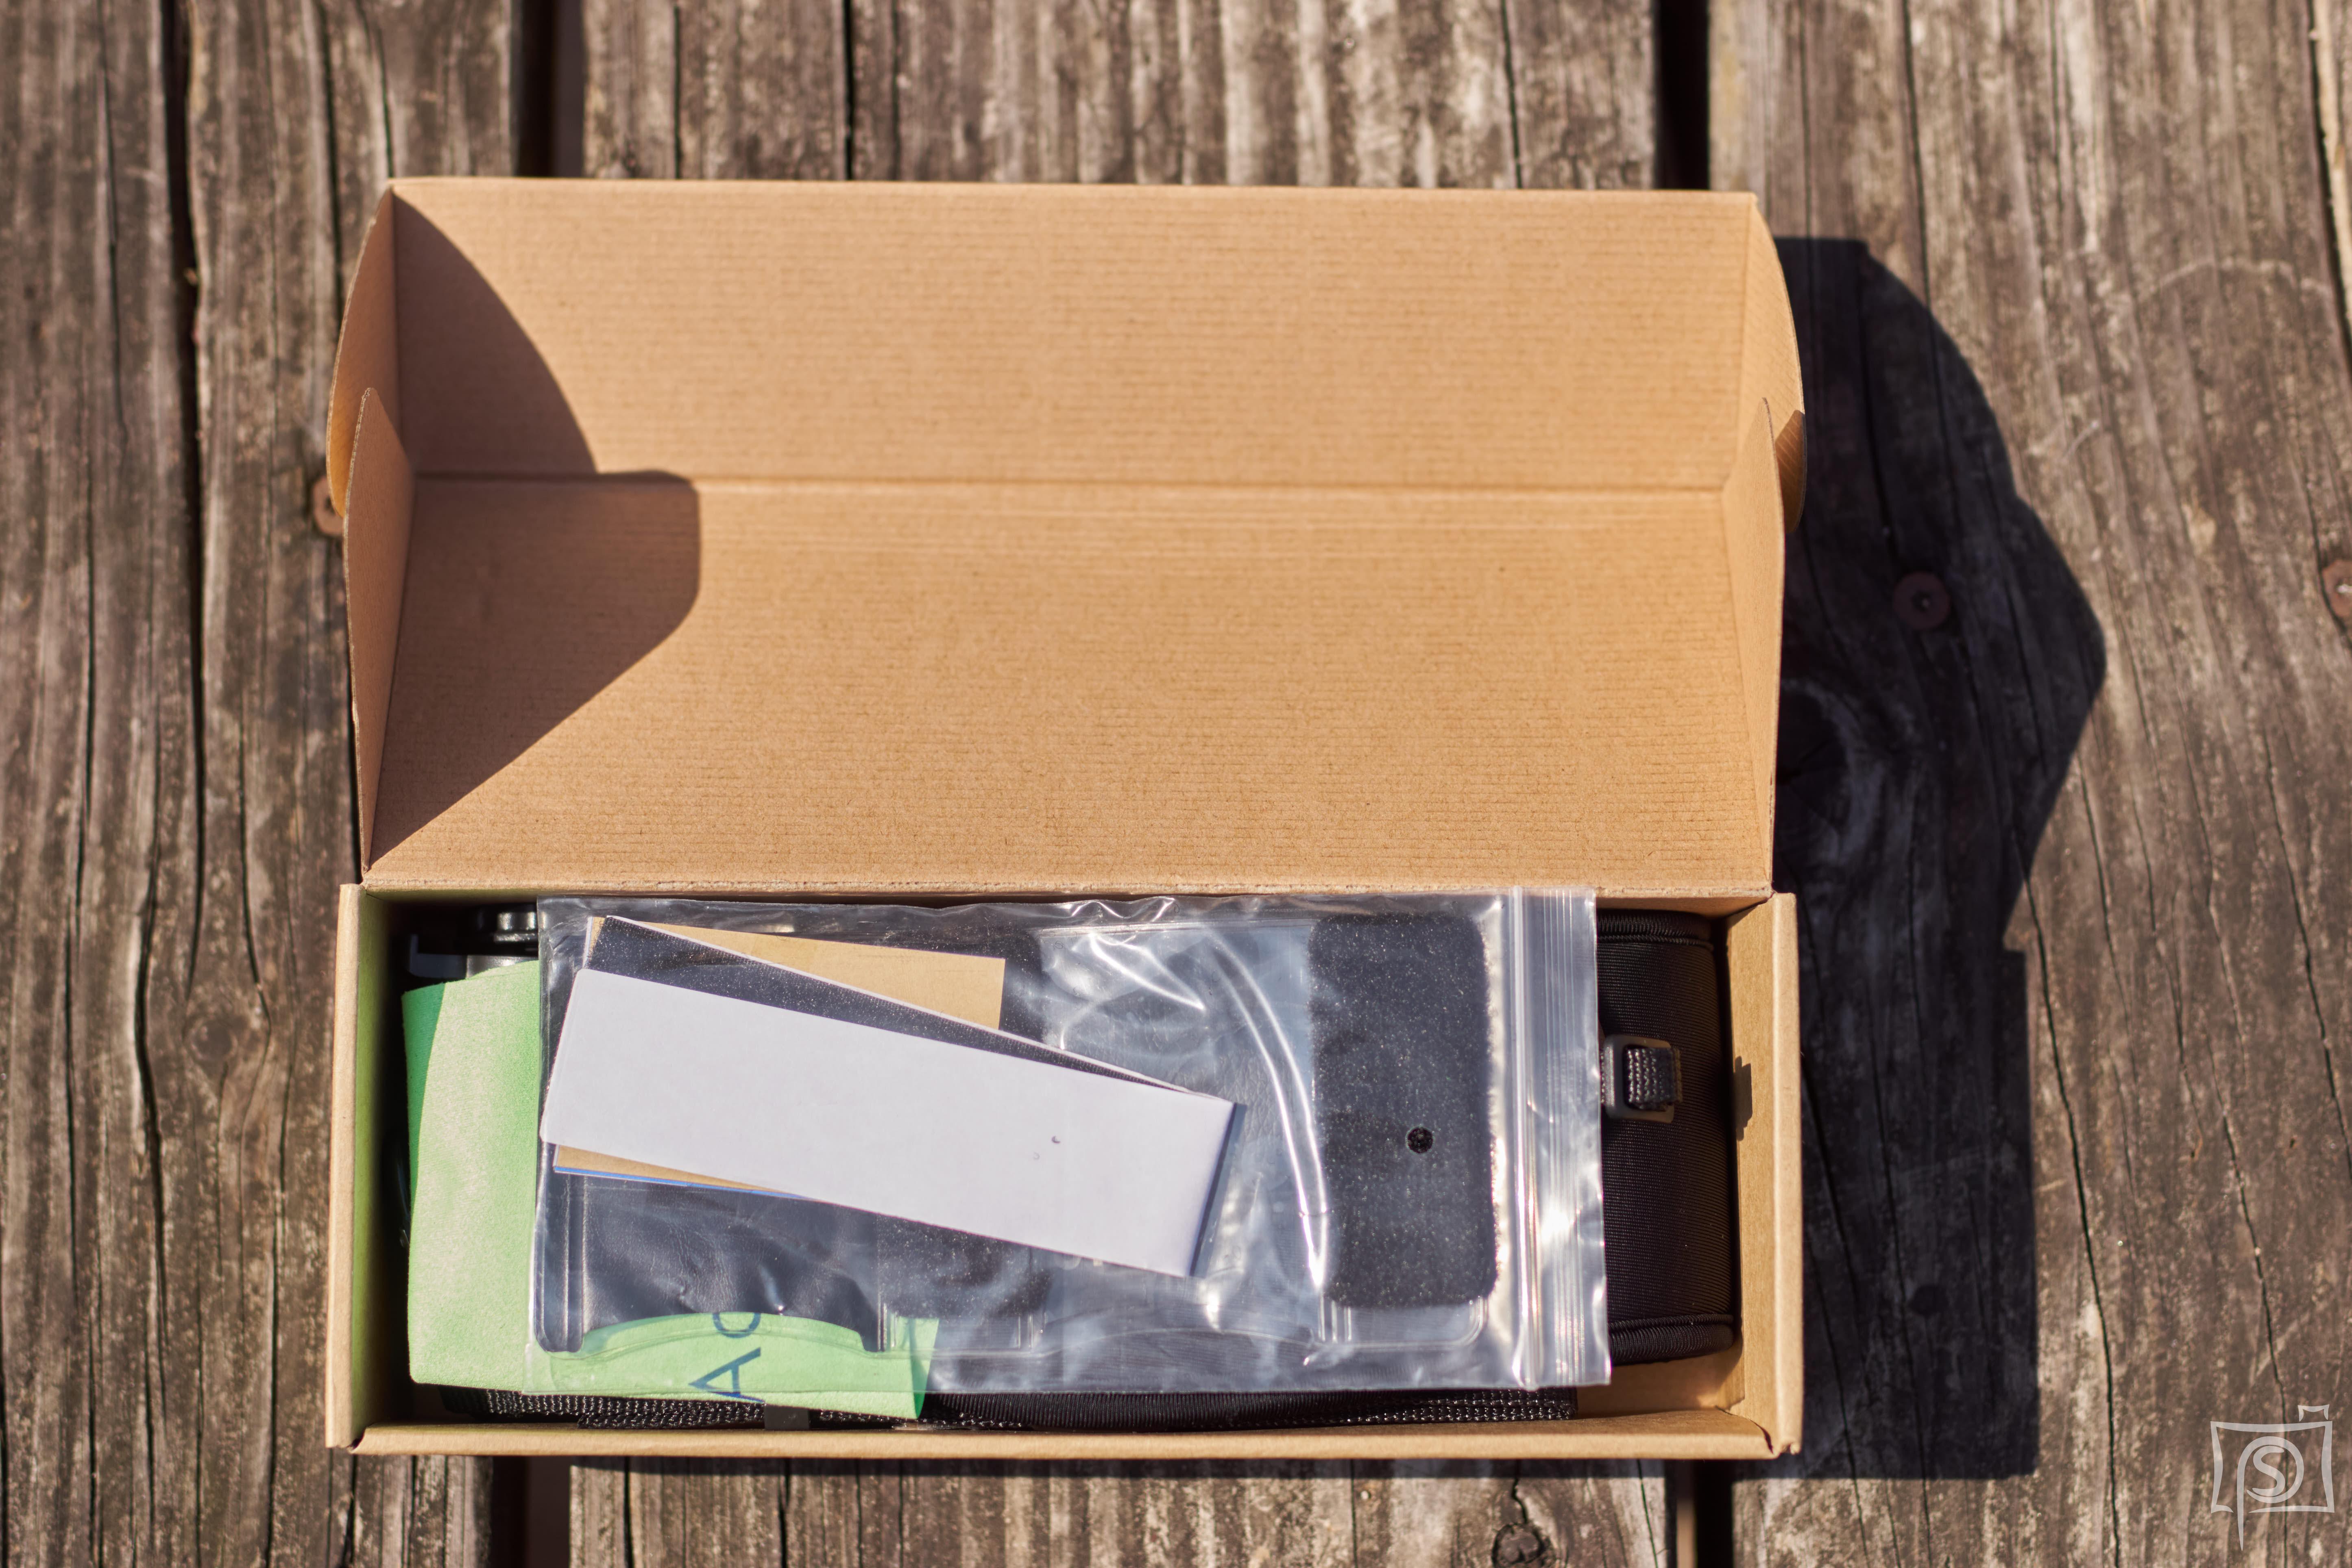 Focus-F2 Pro Verpackung geöffnet